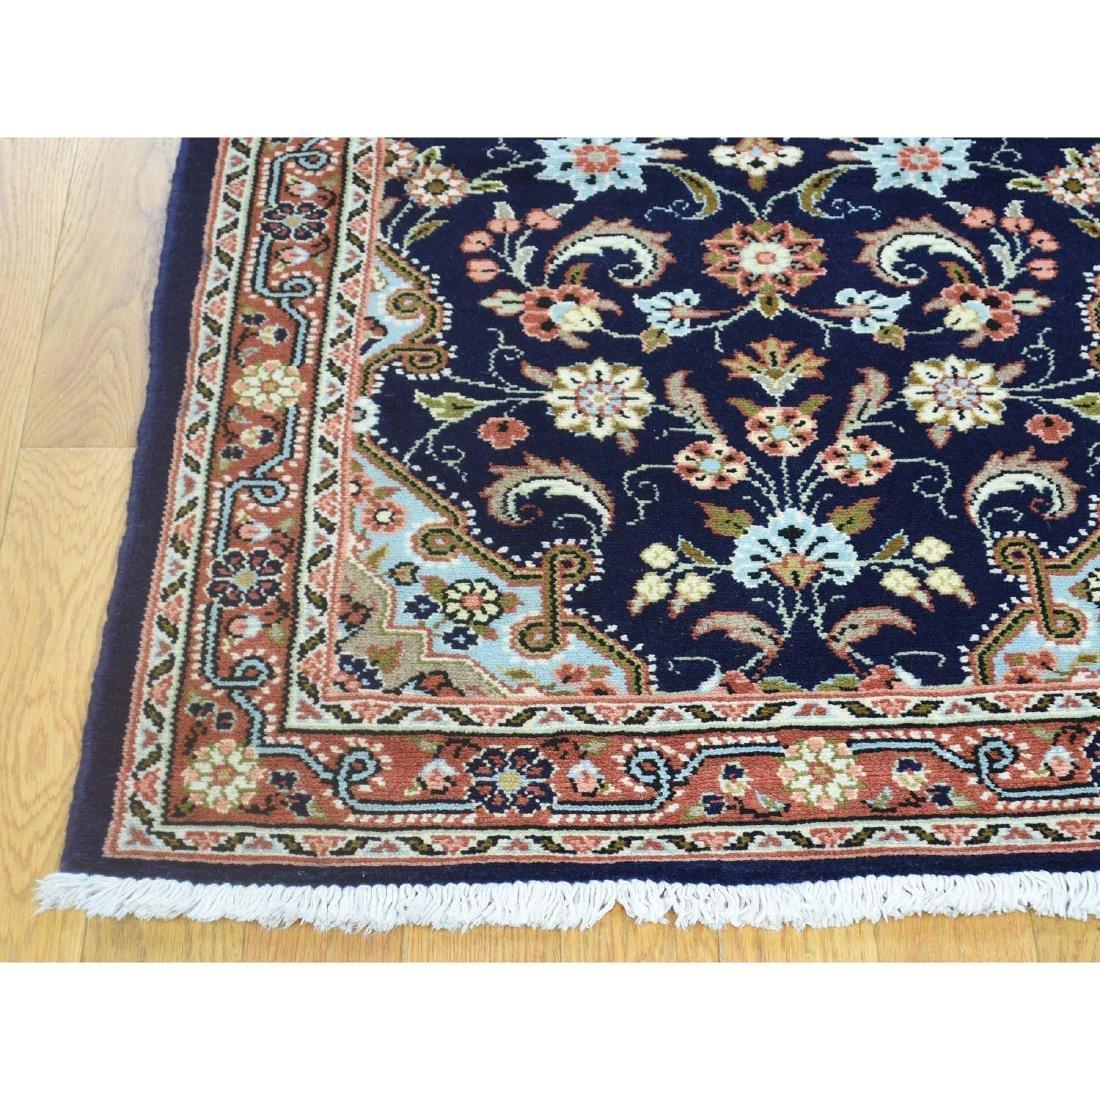 Handmade Persian Hamadan Runner Oriental Rug 2.8x10.2 - 6